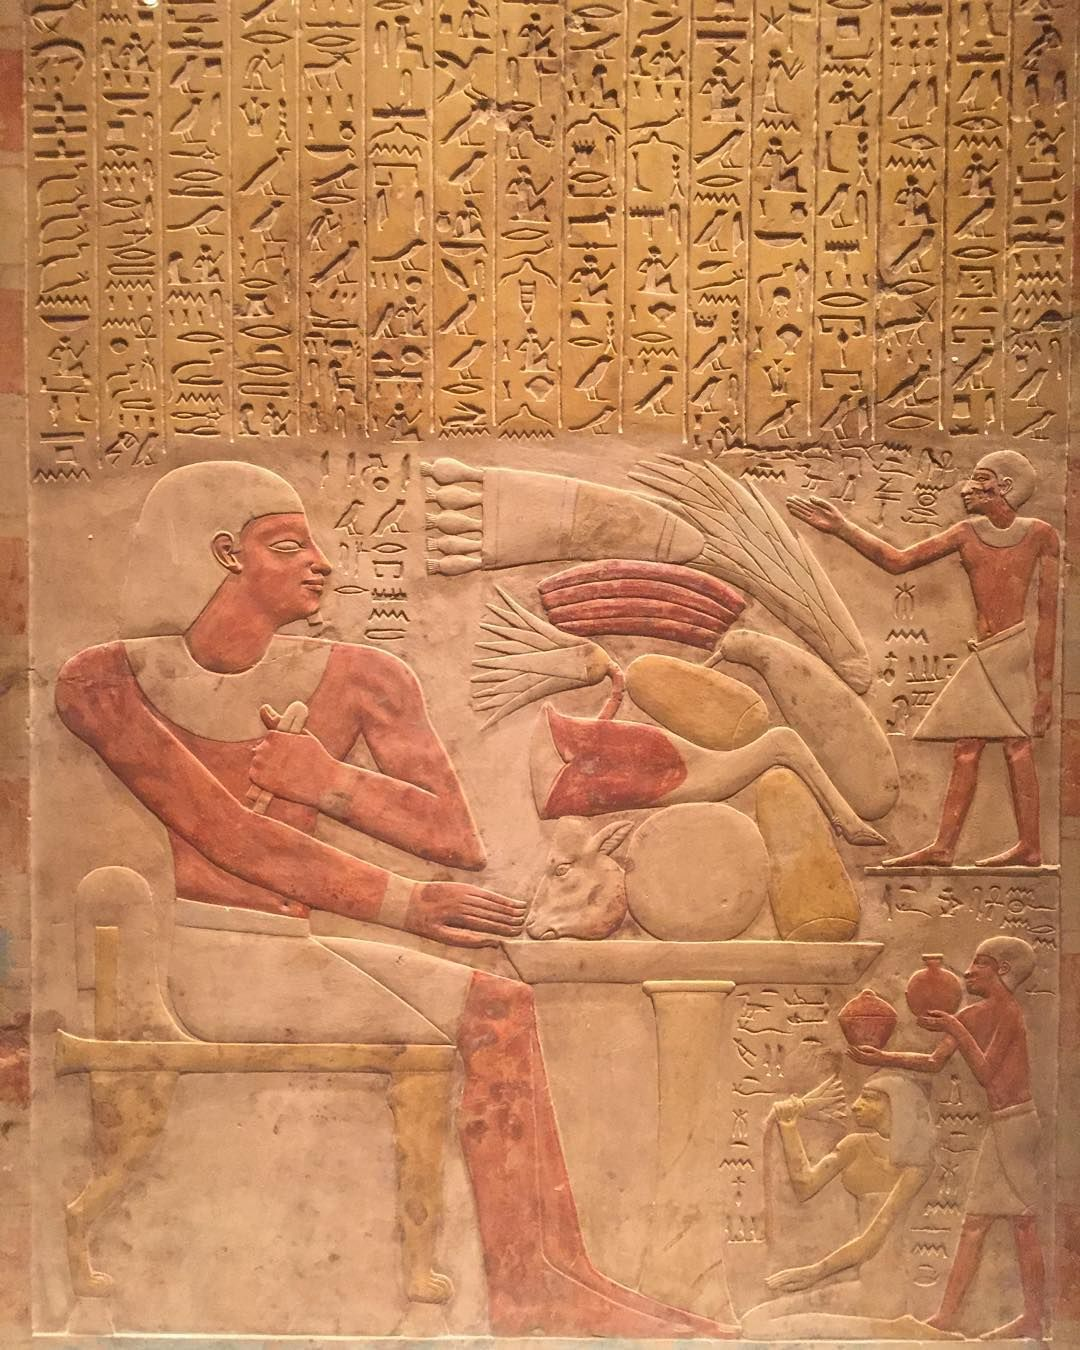 Stela of the Steward Mentuwoser, ca. 1944 B.C. Dynasty 12, reign of Senwosret I, year 17. #metmuseum #MiddleKingdomEgypt